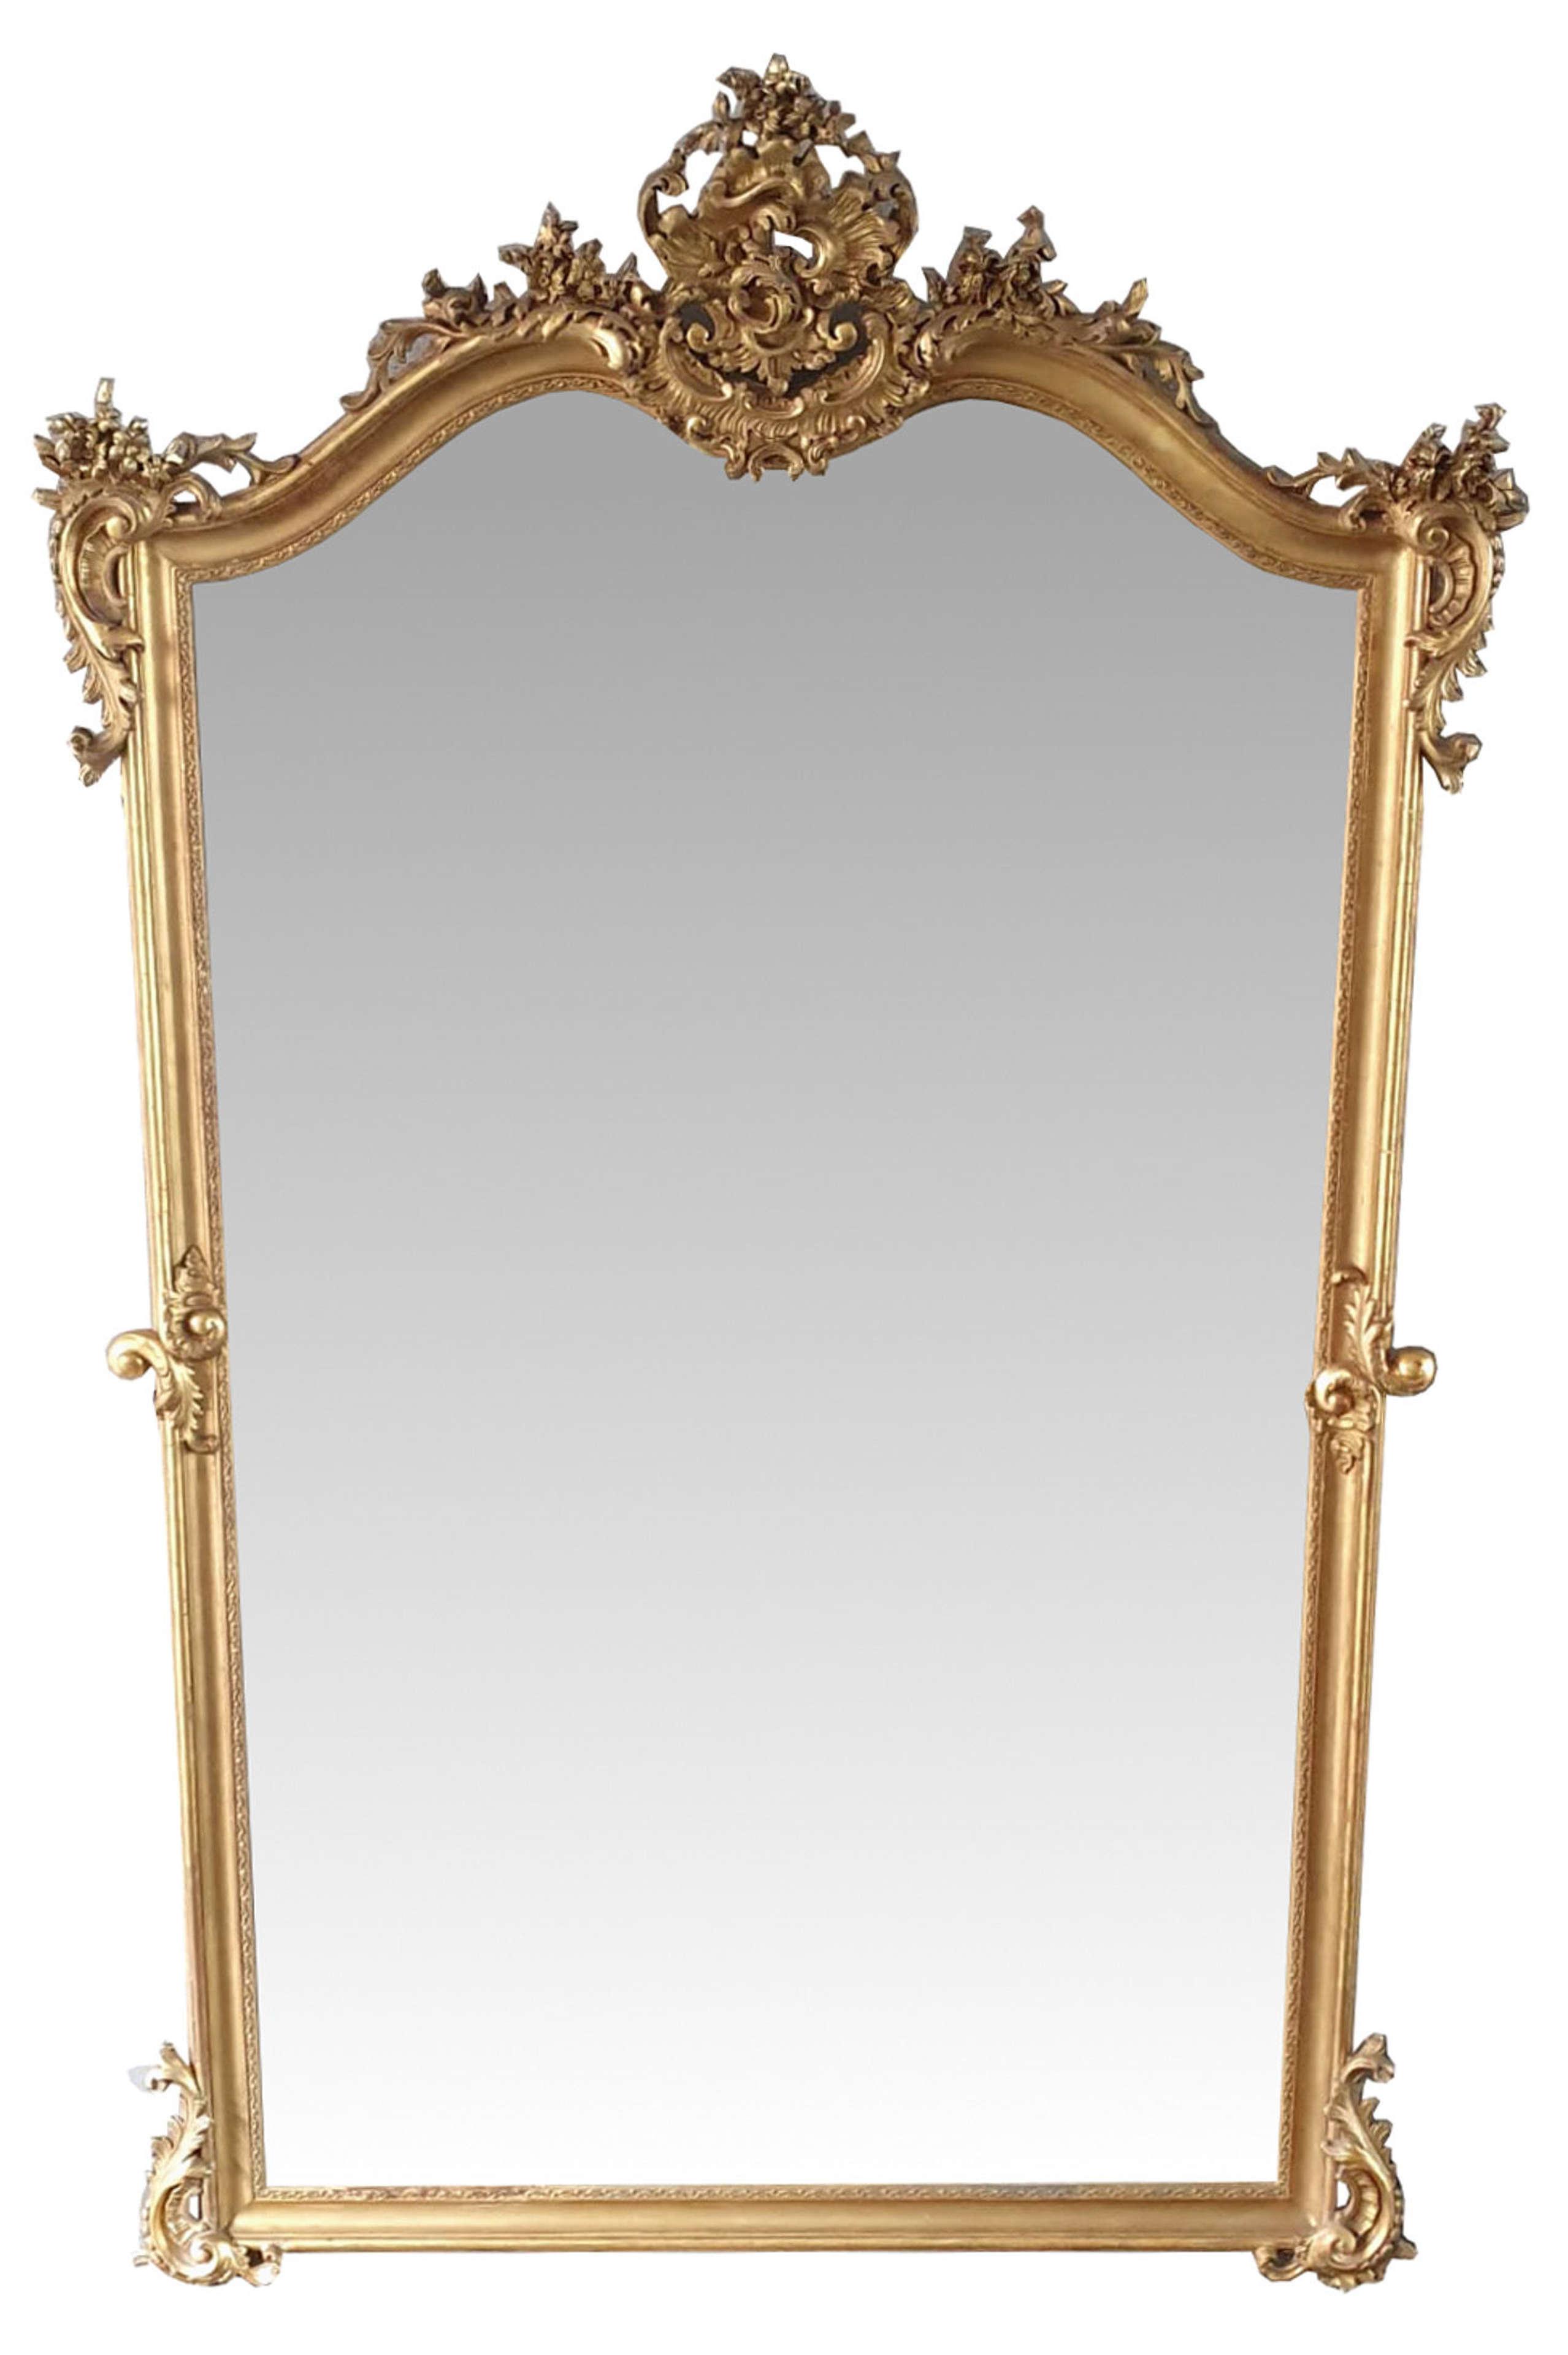 Tall 19th Century Gilt Dressing or Hall Mirror